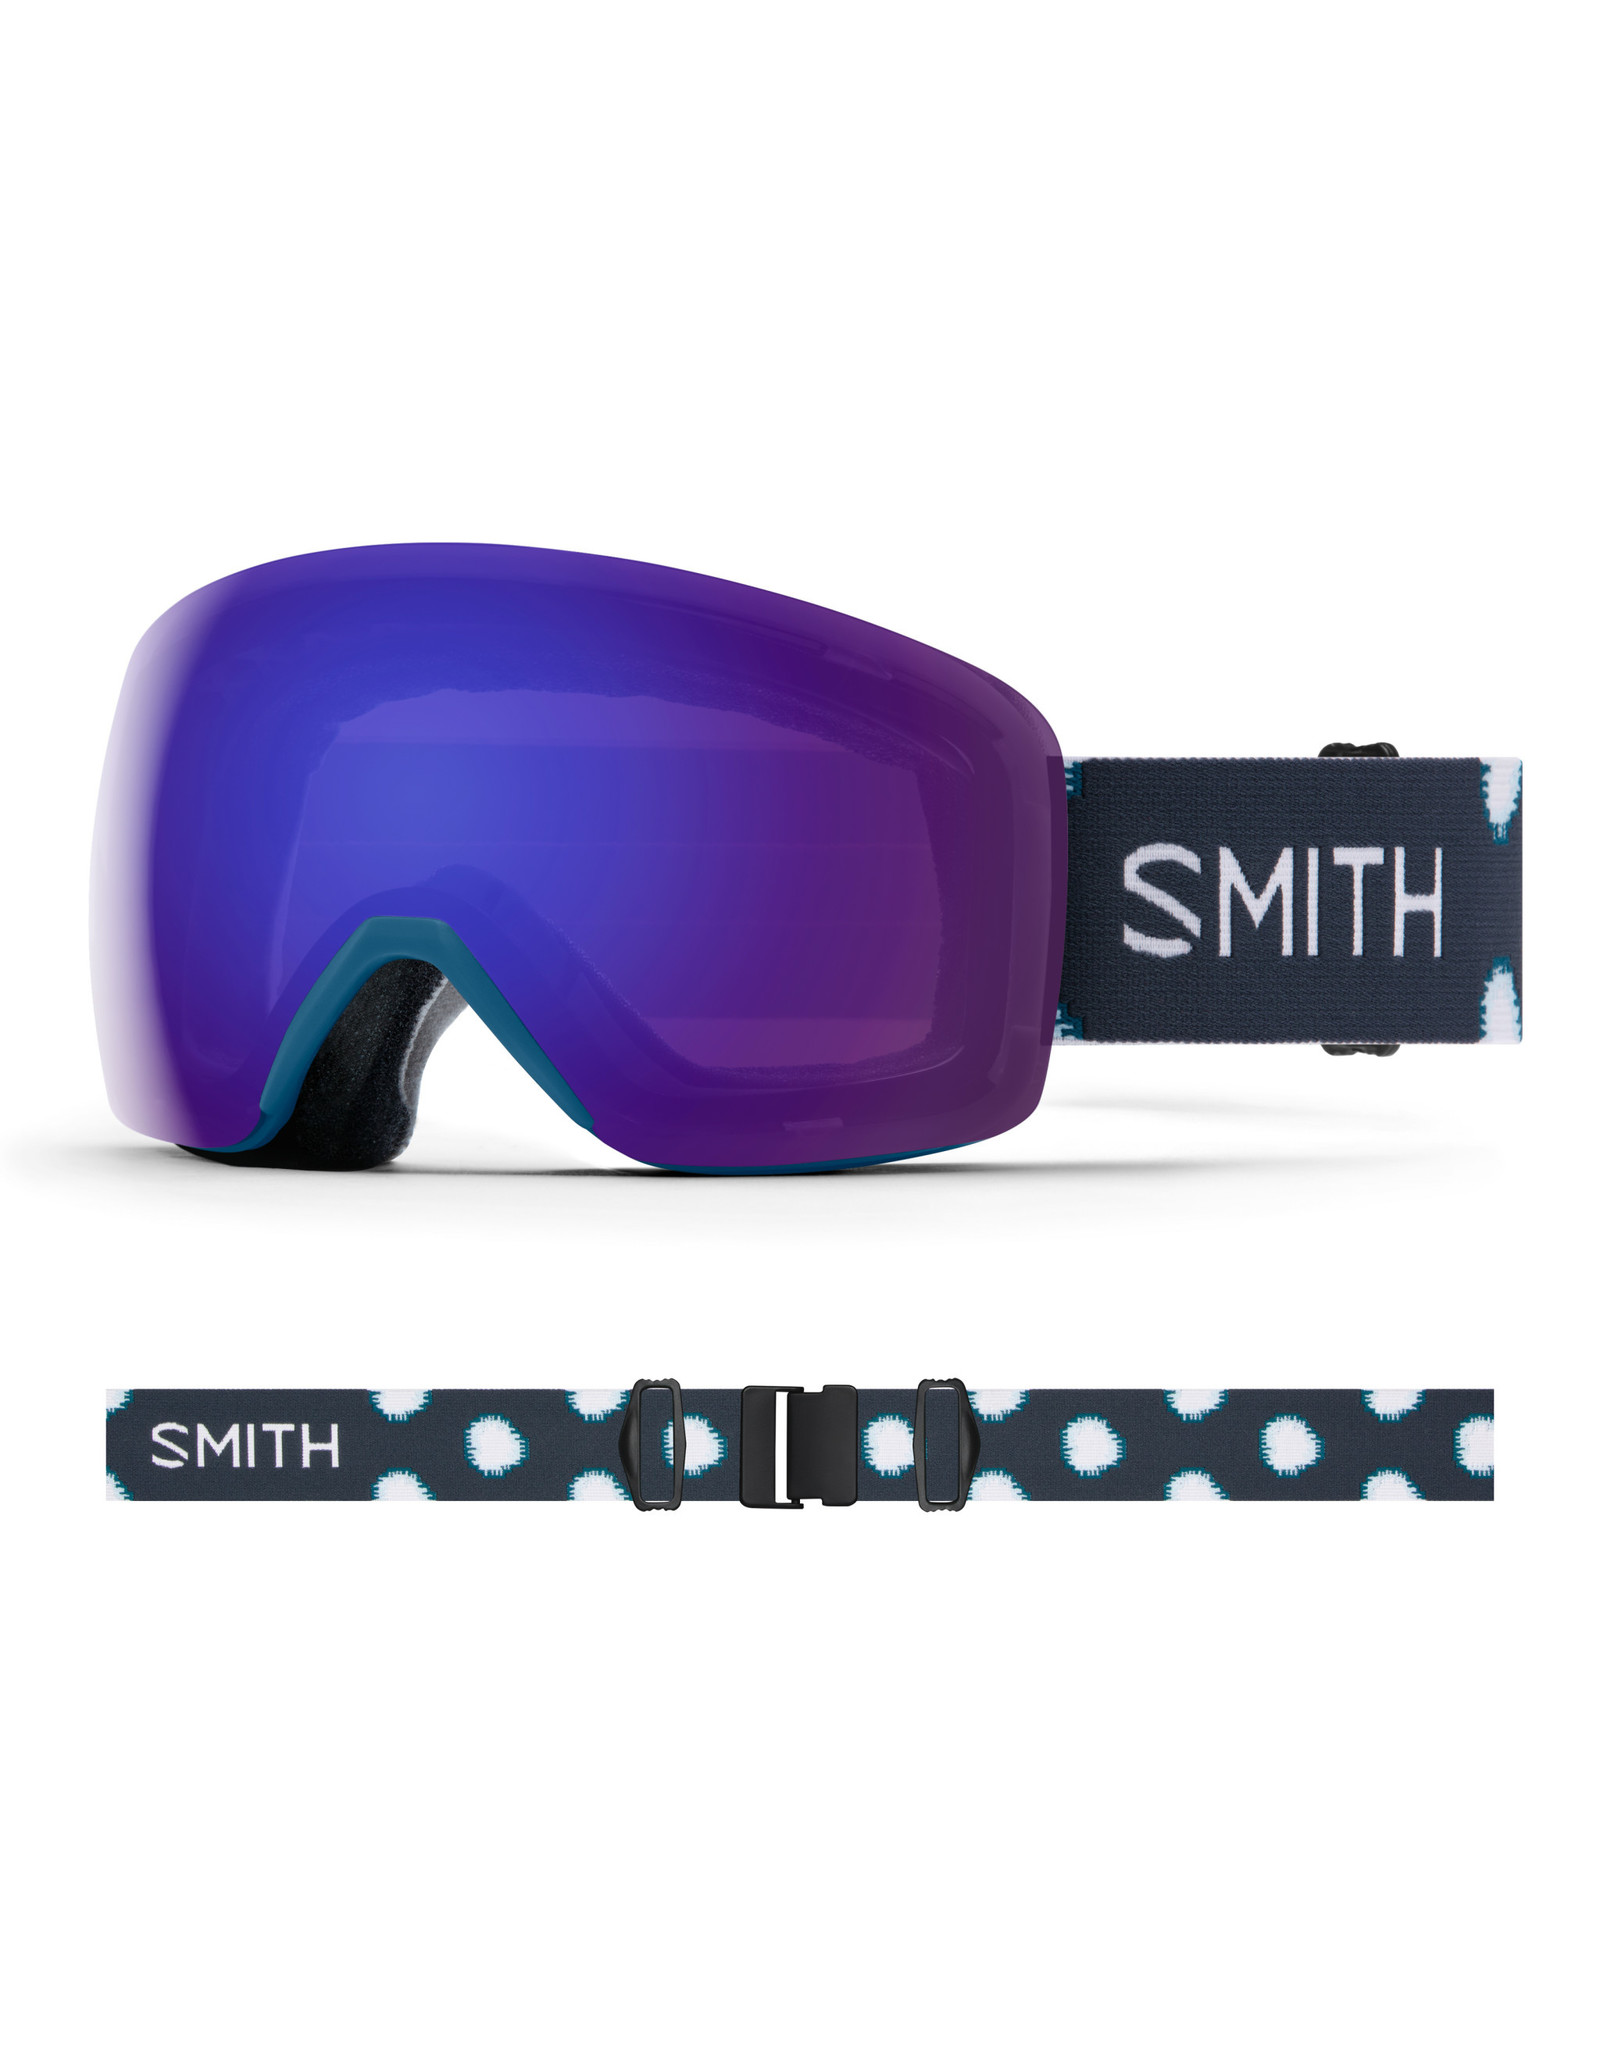 Smith SMITH SKYLINE MERIDIAN IKAT 20 LUNETTES DE SKI